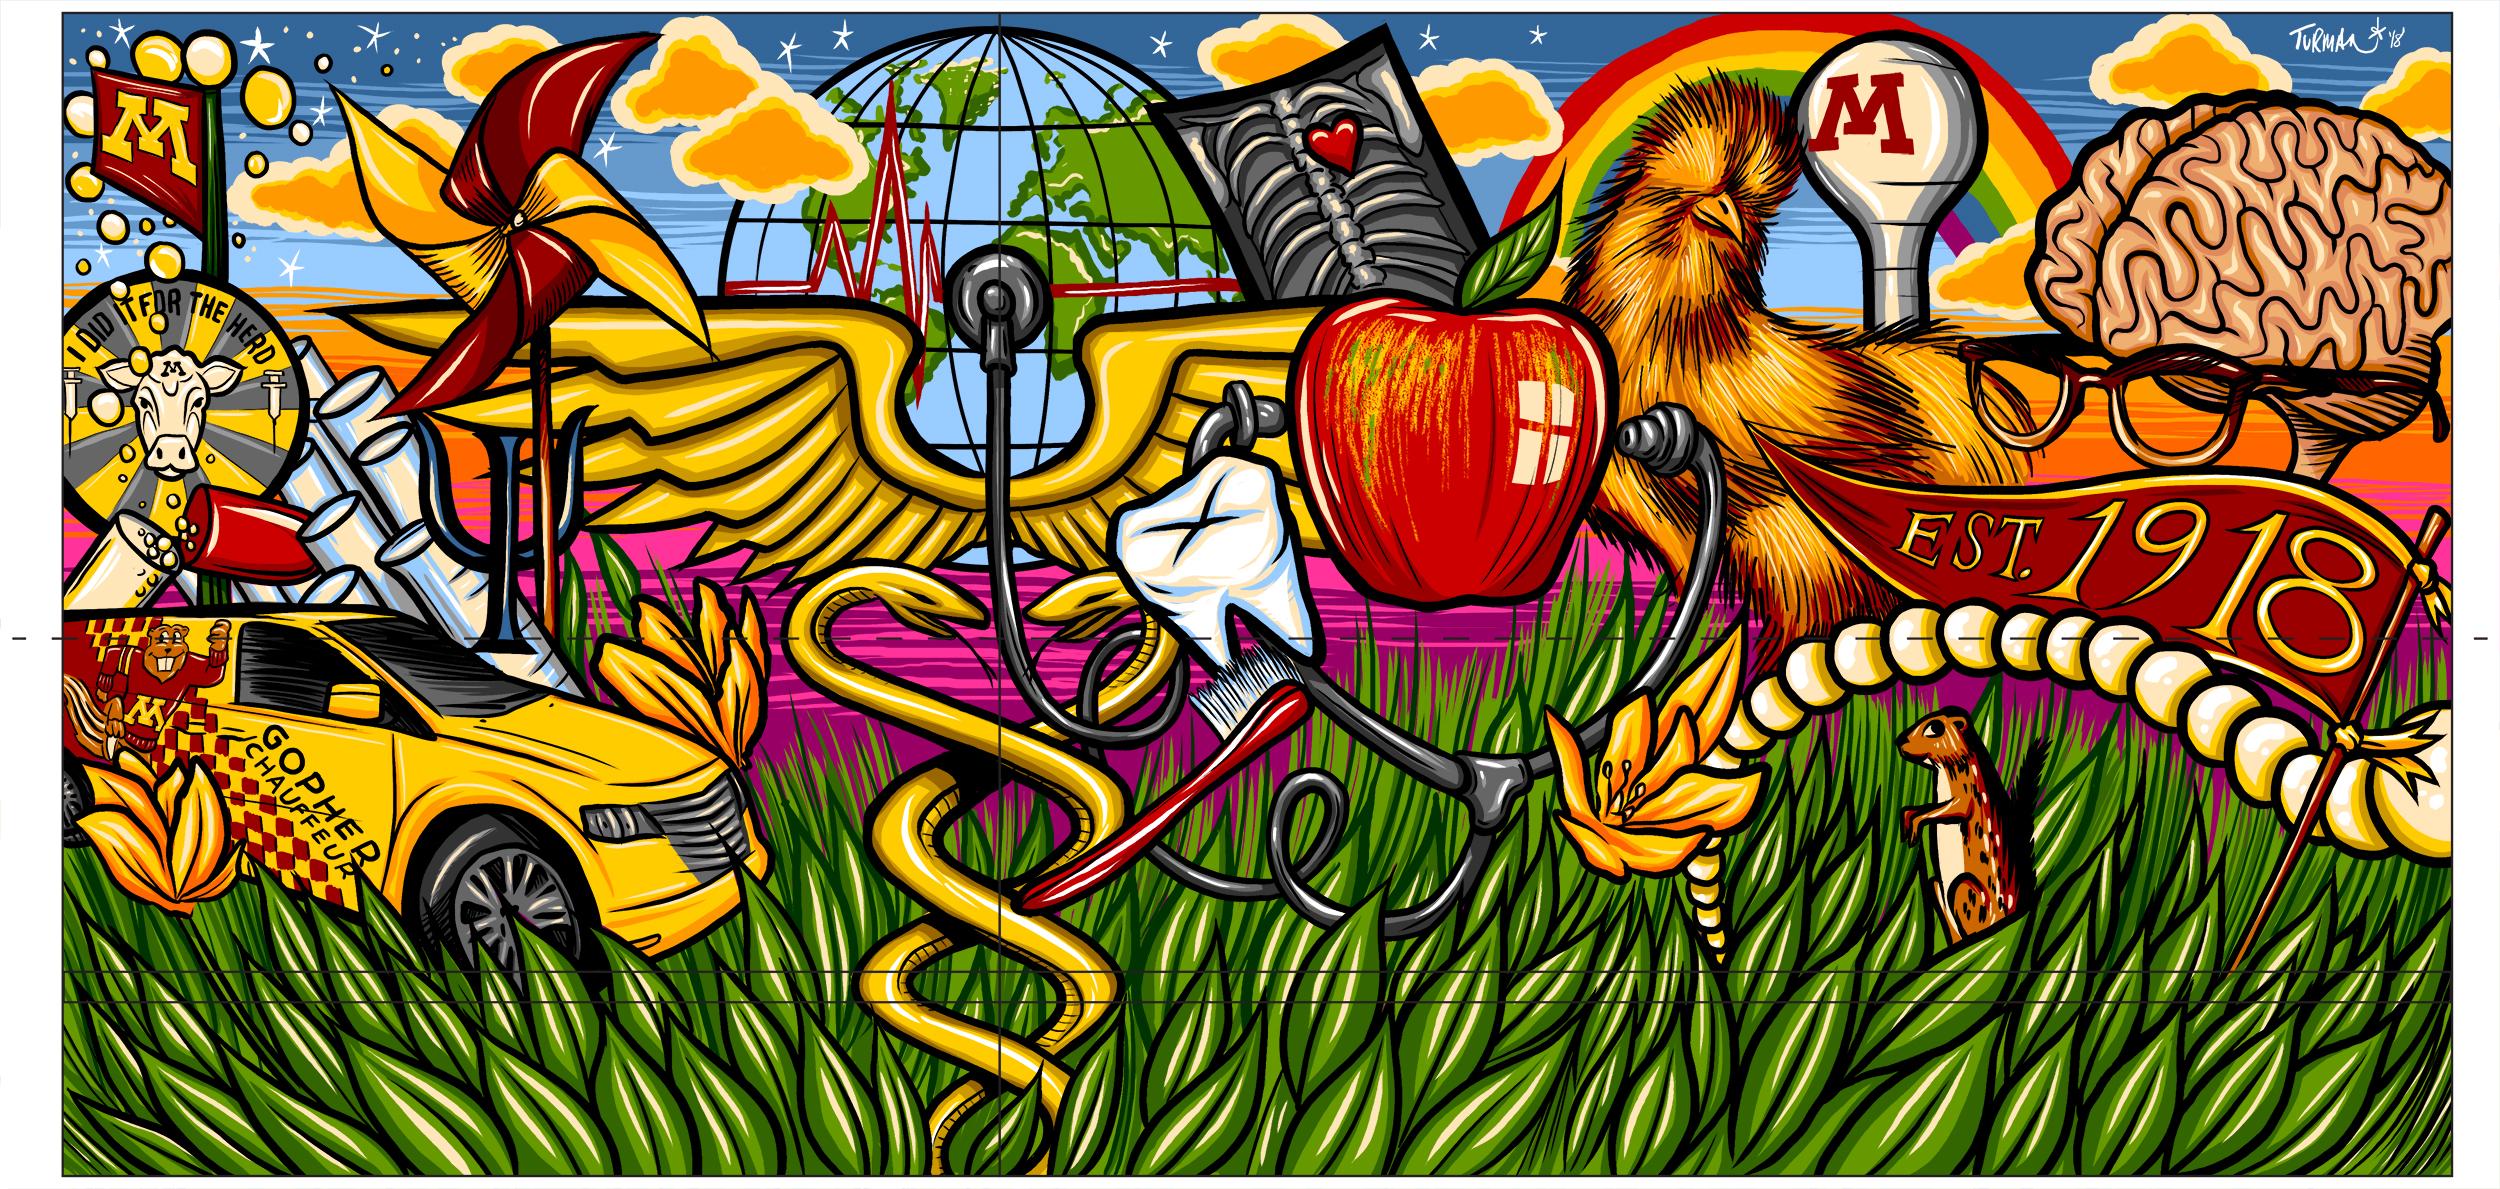 UofM_Boynton_Mural_PRF3.jpg